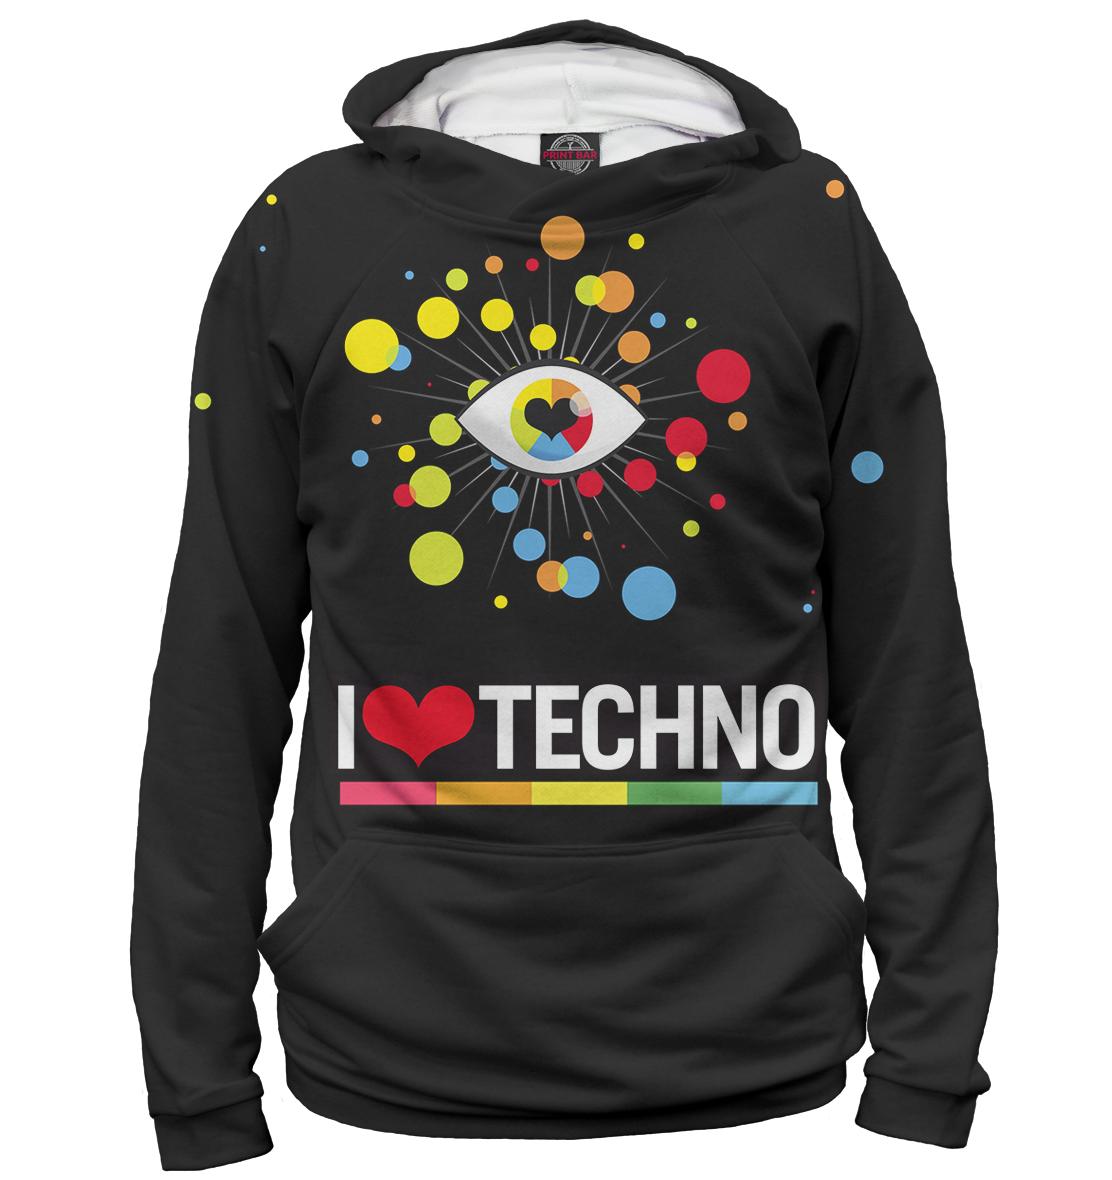 Купить I Love Techno, Printbar, Худи, TEC-845339-hud-1